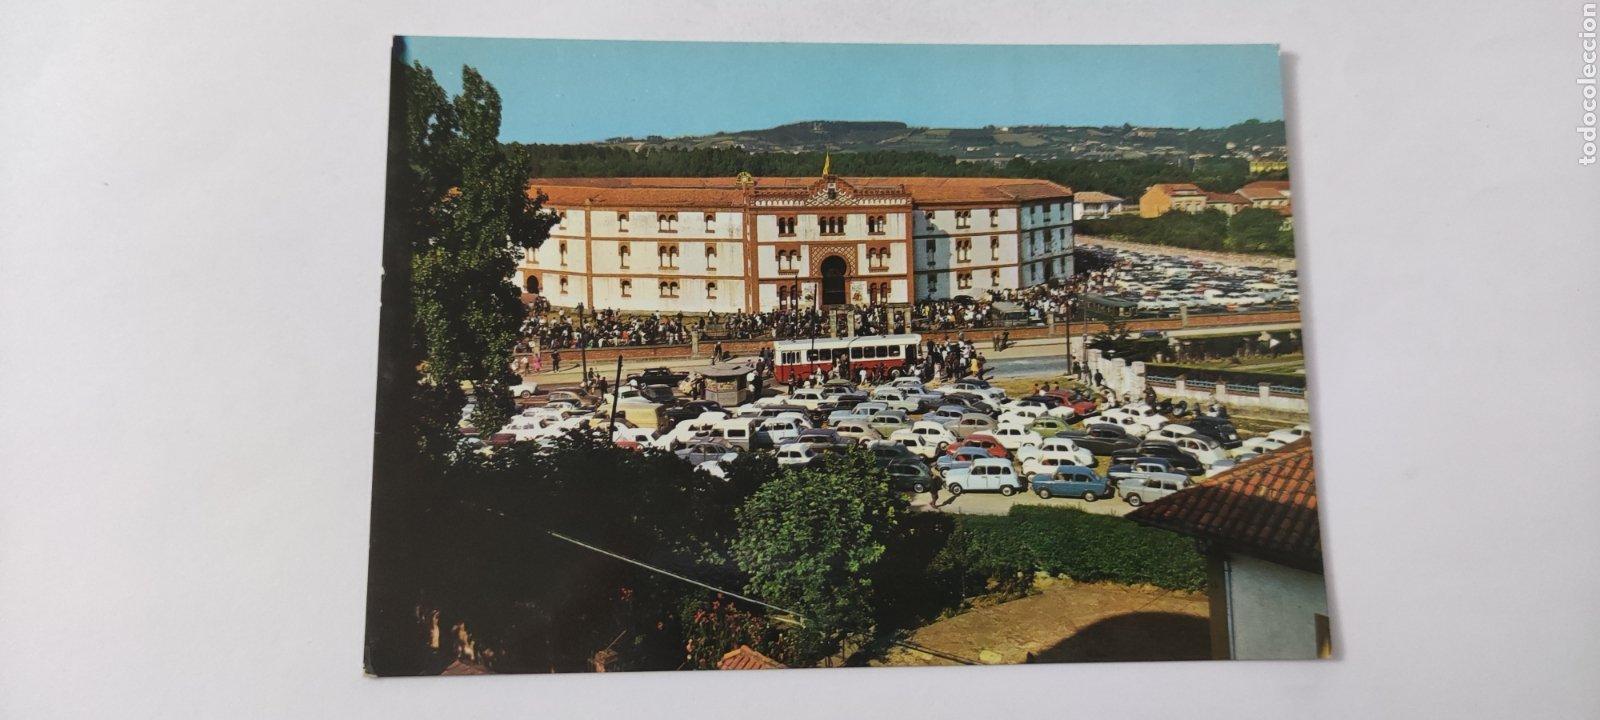 POSTAL 2053 PLAZA DE TOROS GIJÓN (Postales - España - Asturias Moderna (desde 1.940))